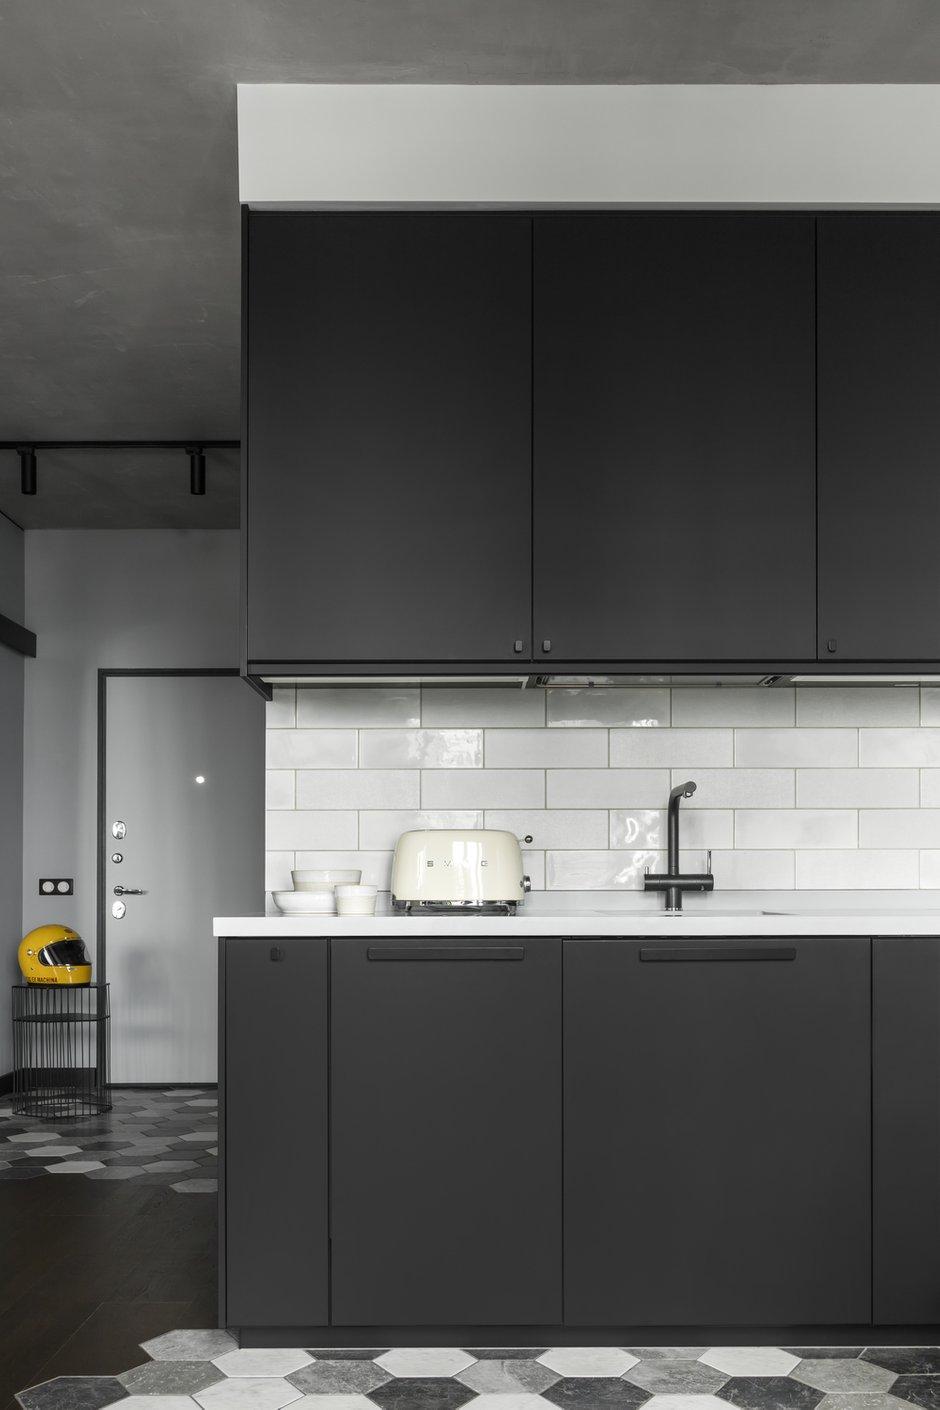 Фотография: Кухня и столовая в стиле Лофт, Квартира, Студия, Проект недели, Москва, 1 комната, до 40 метров, 40-60 метров, Влада Загайнова – фото на INMYROOM